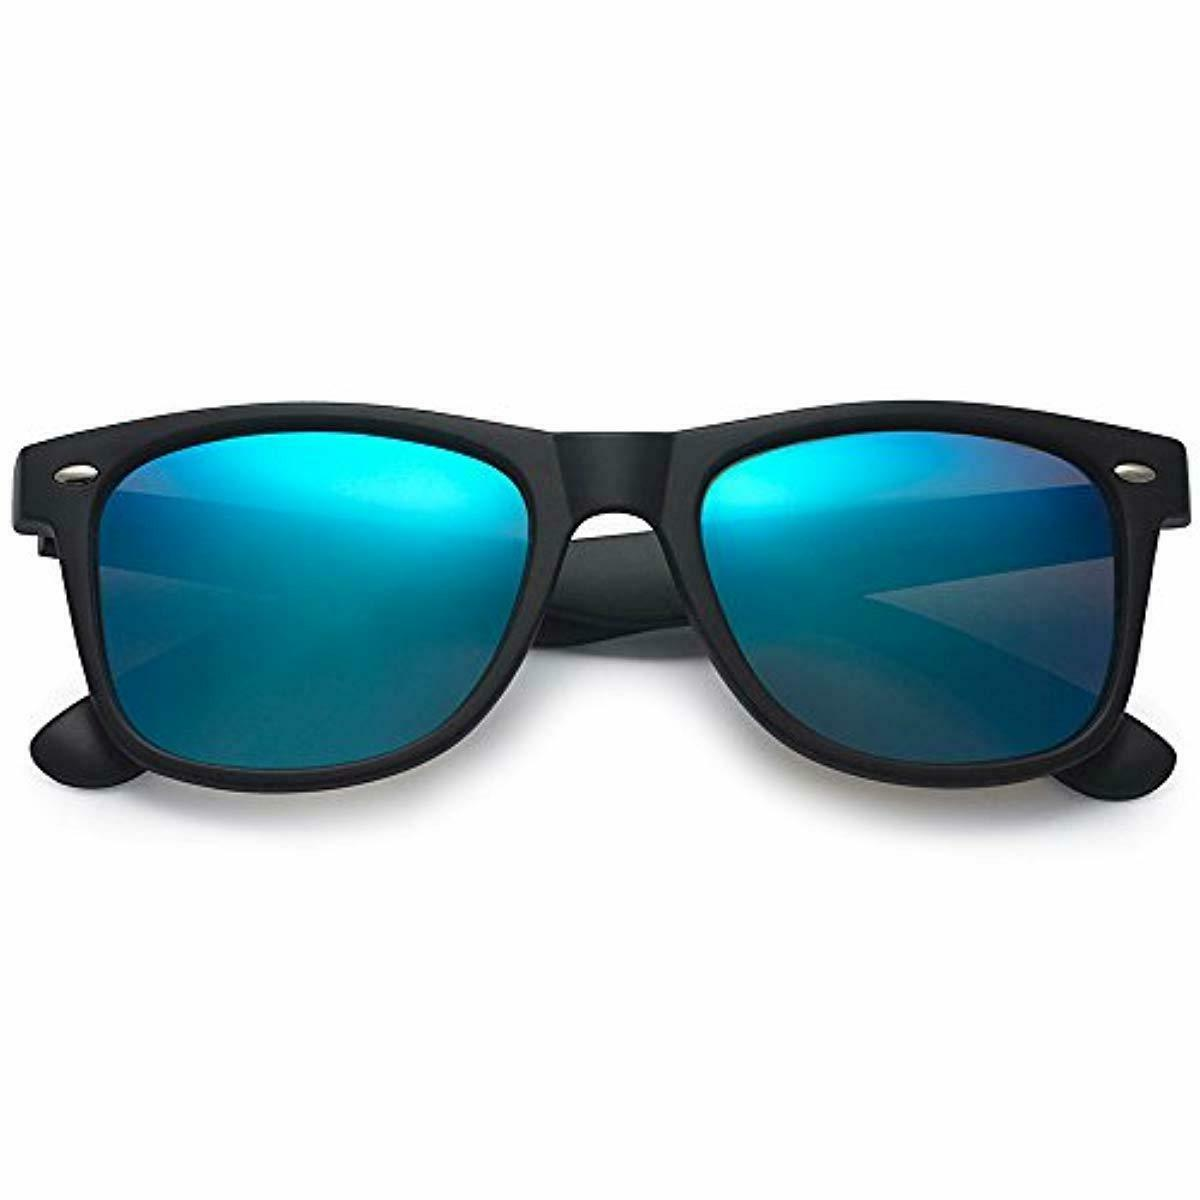 Retro Stylish Sunglasses for Men Women